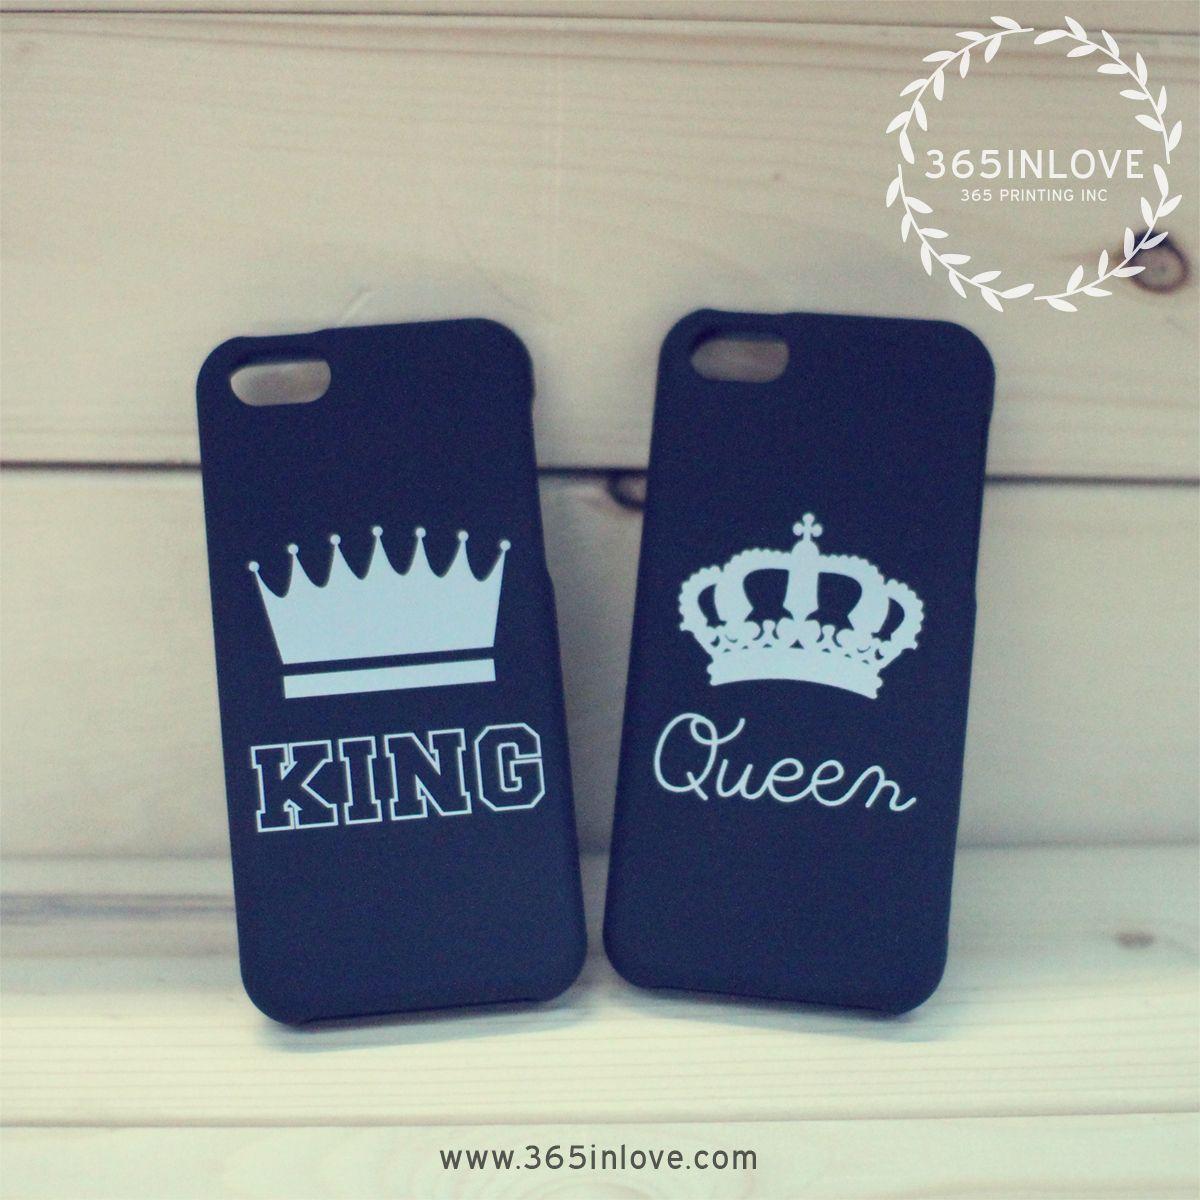 king queen tumblr - Buscar con Google | Telefoni, Principesse, Creativo